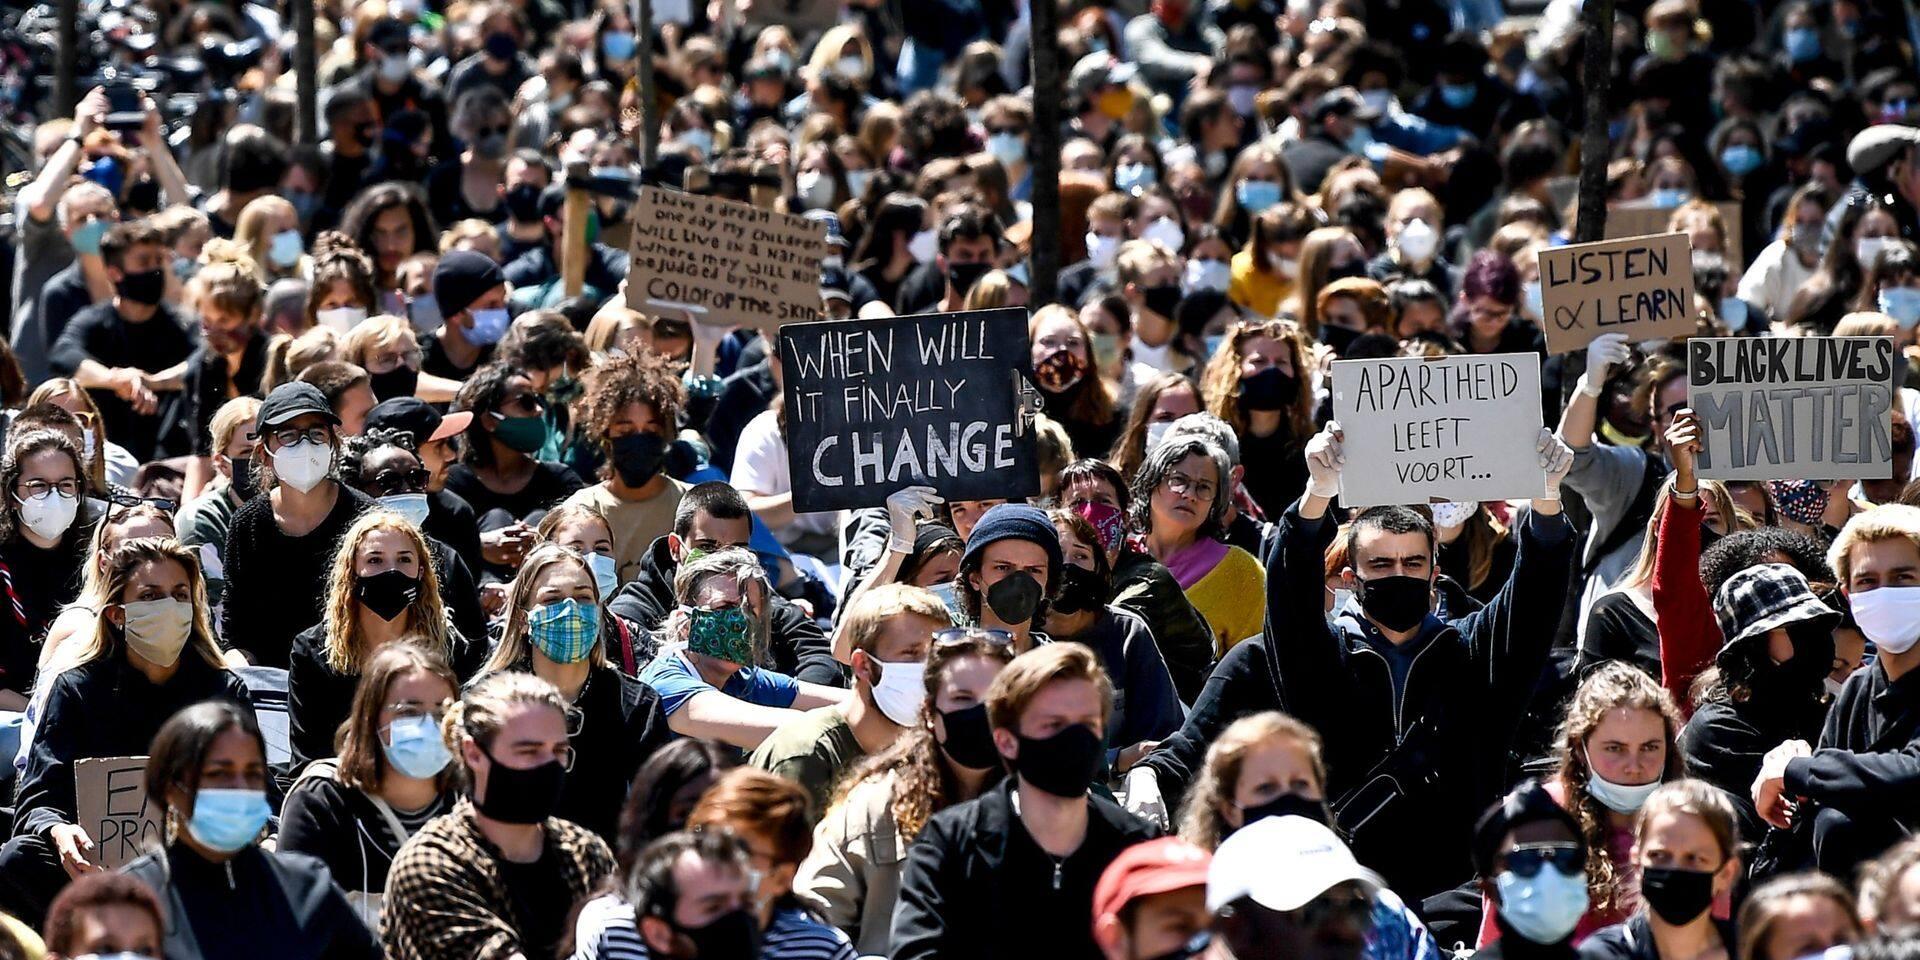 Manifestation Black Lives Matter à Anvers : 115 personnes interpellées